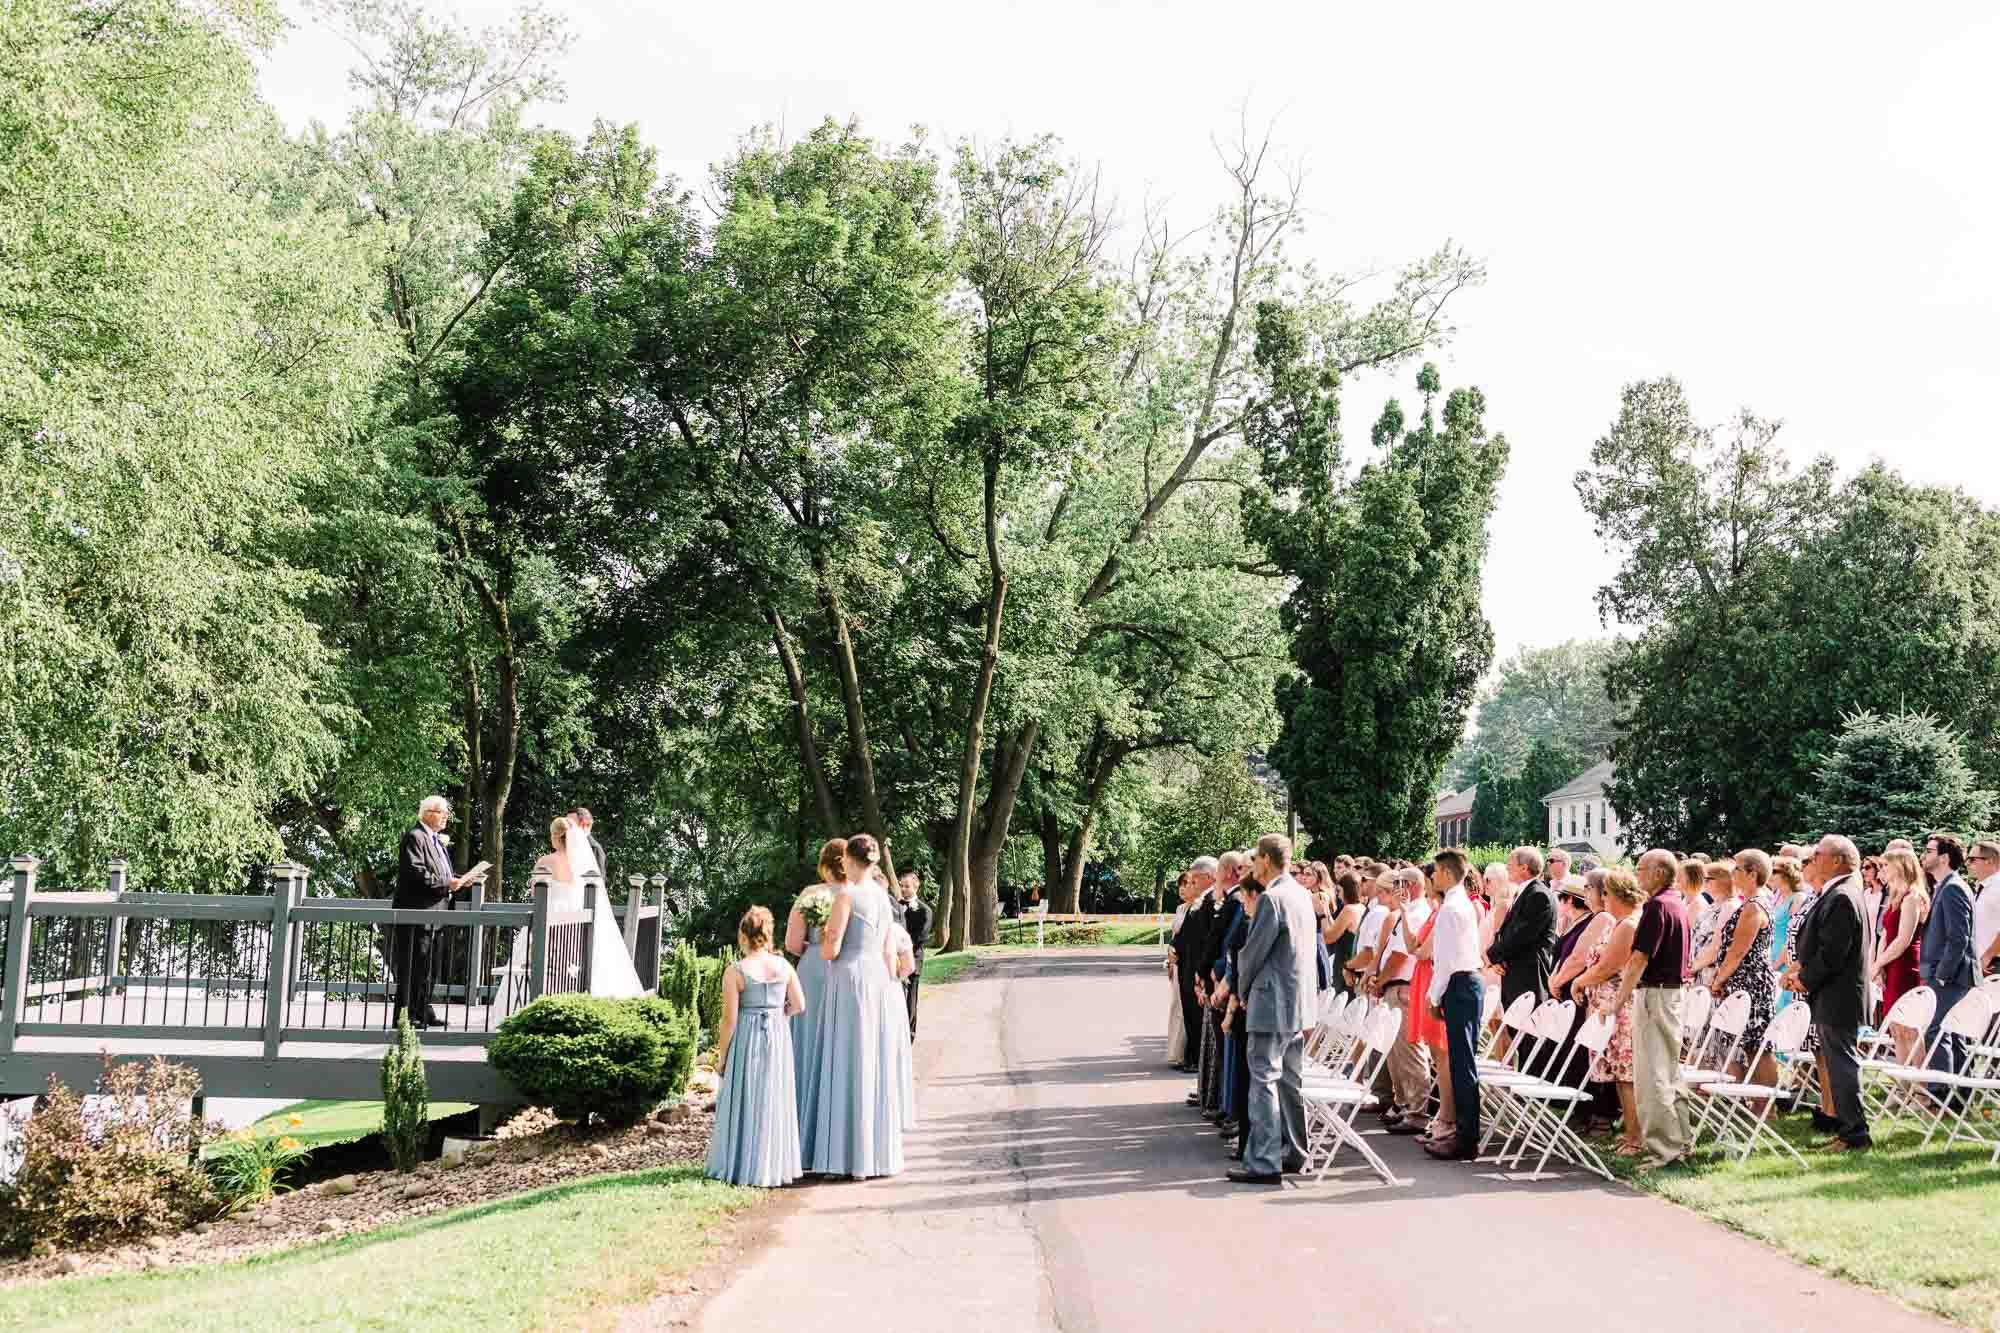 isle-of-que-wedding-6723.jpg